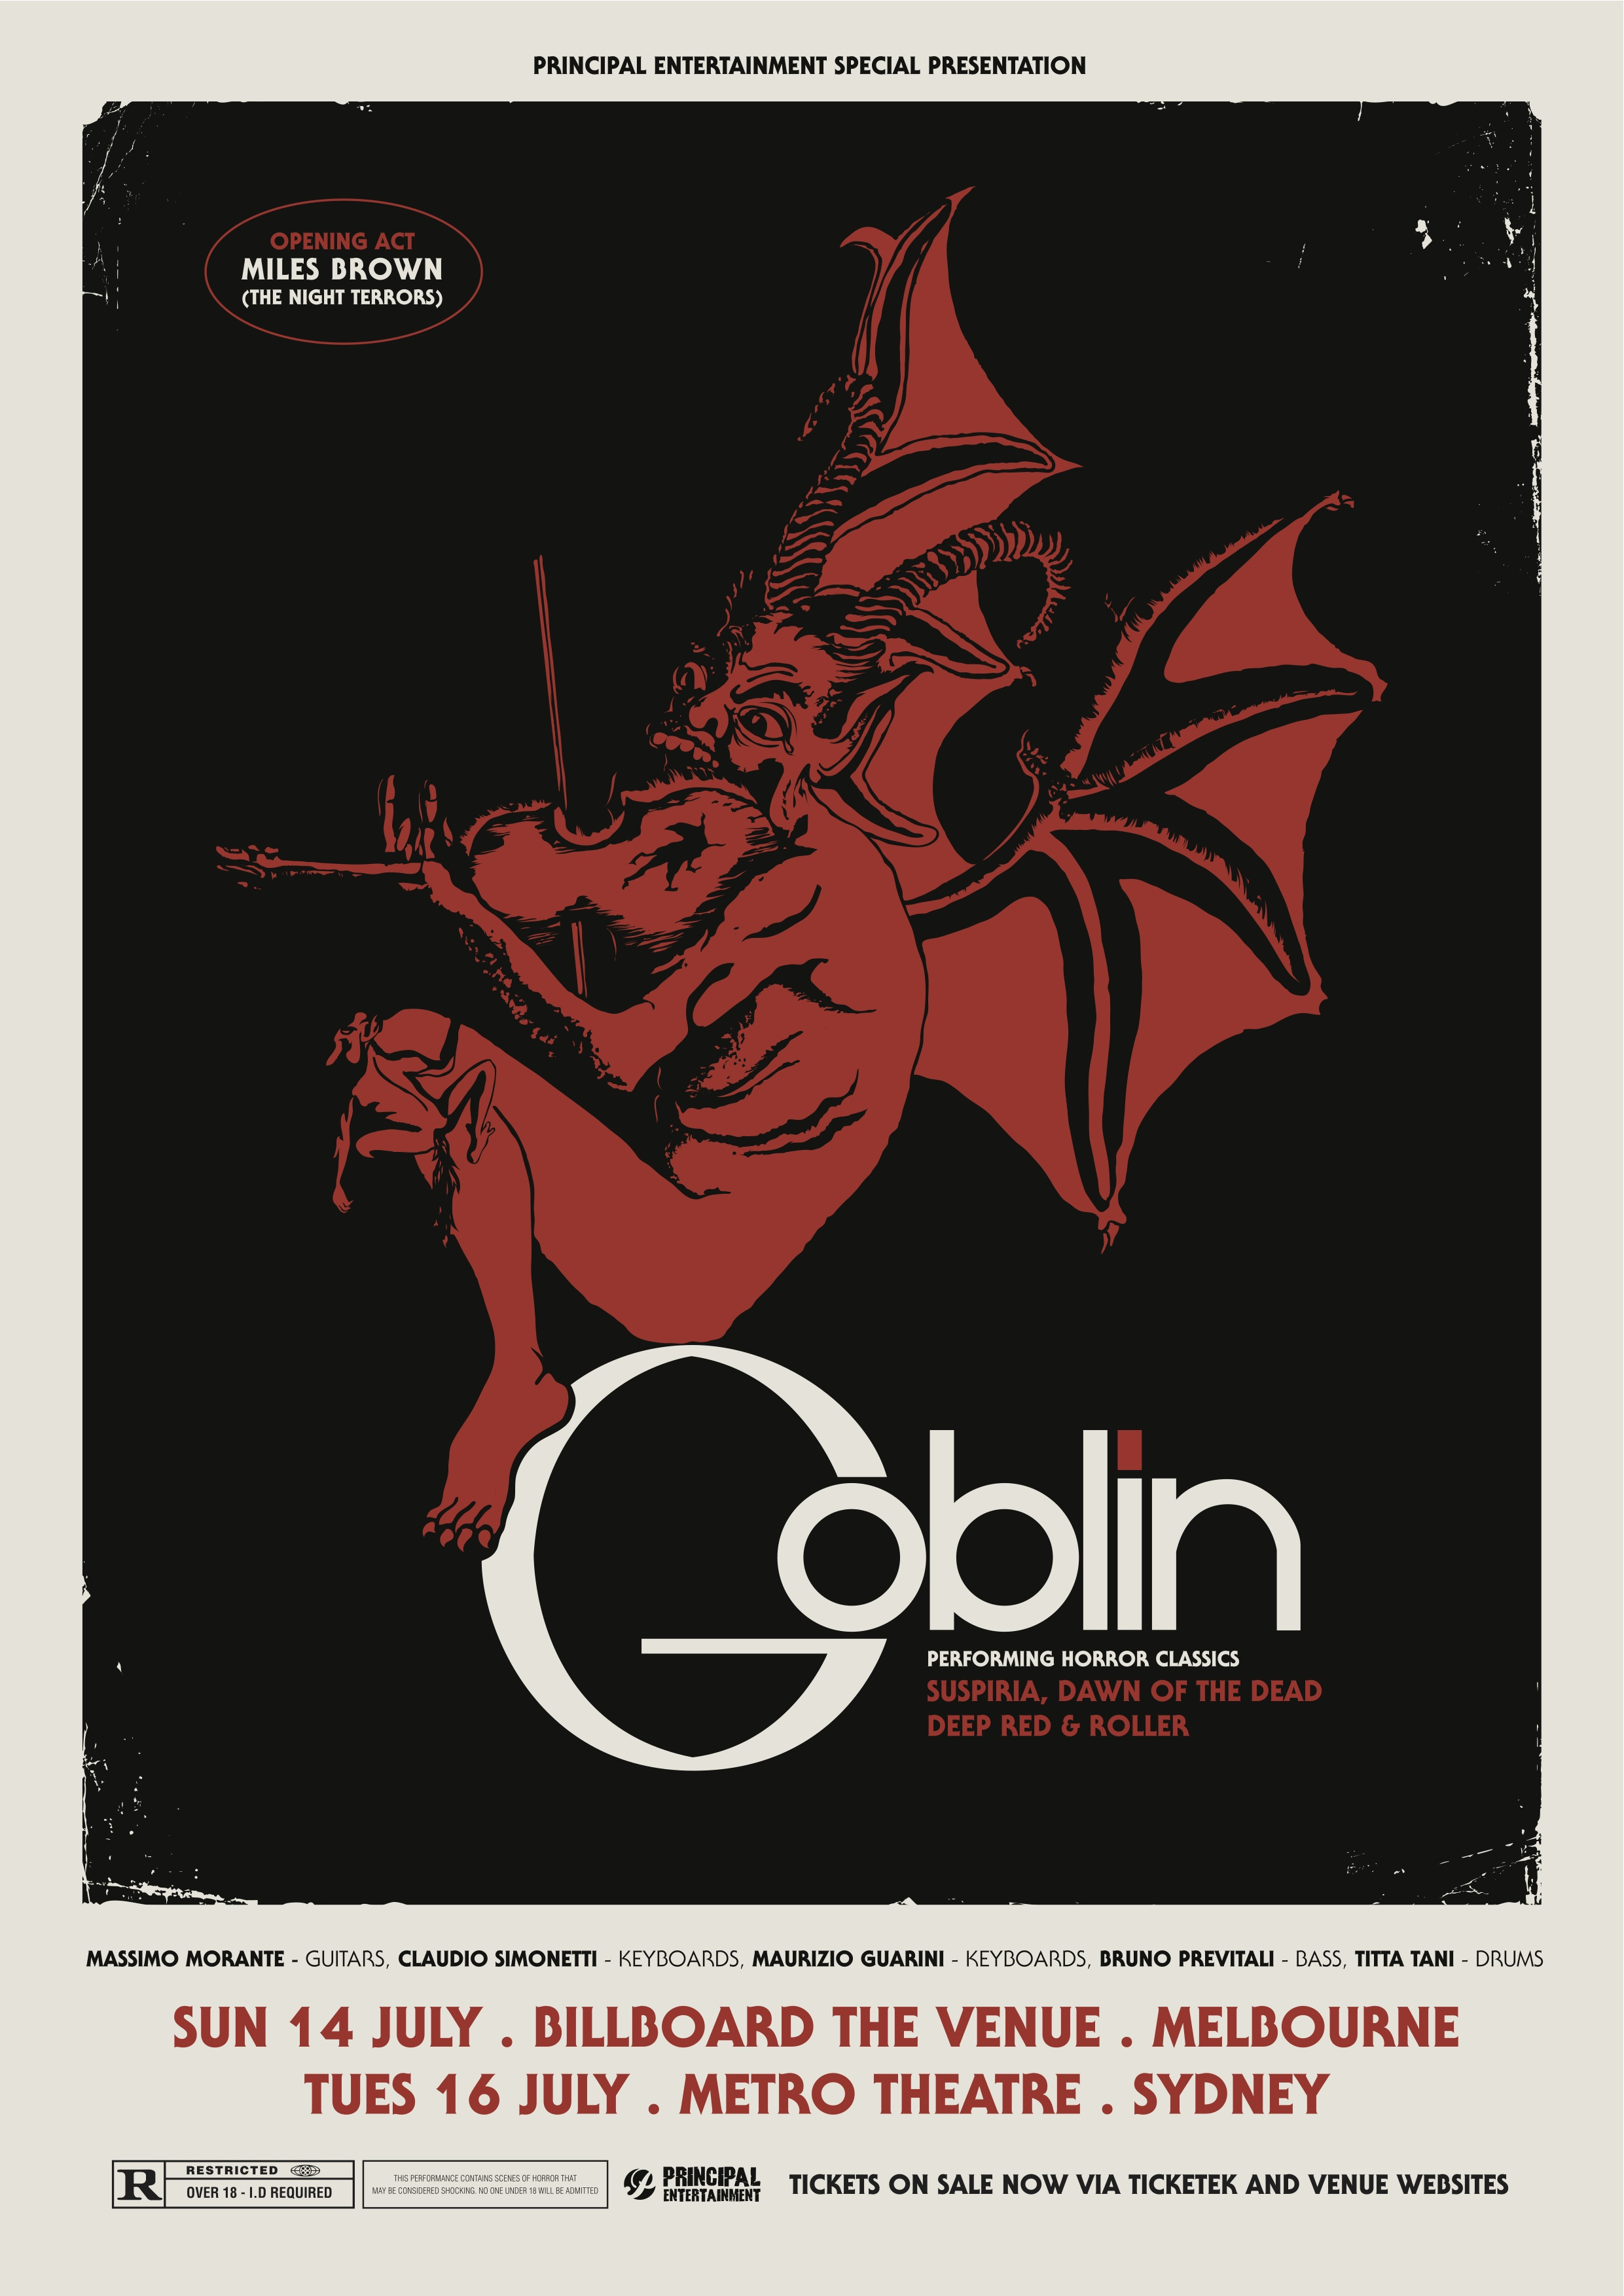 GoblinAustraliaPoster